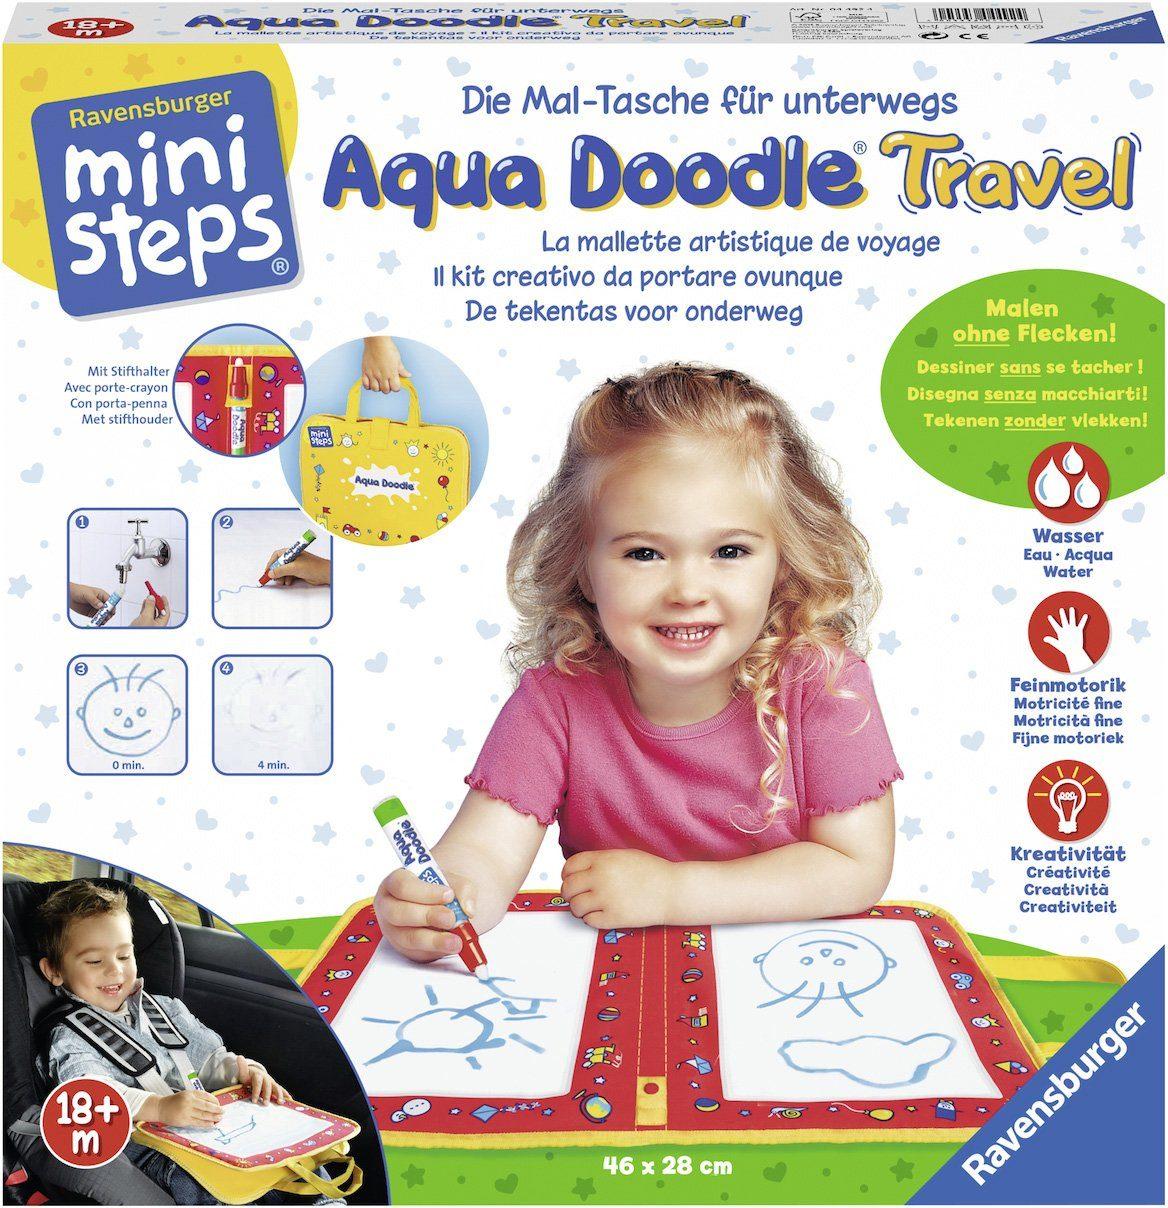 Ravensburger Set bestehend aus: Malmatte und Stift, »ministeps® Aqua Doodle® Travel«